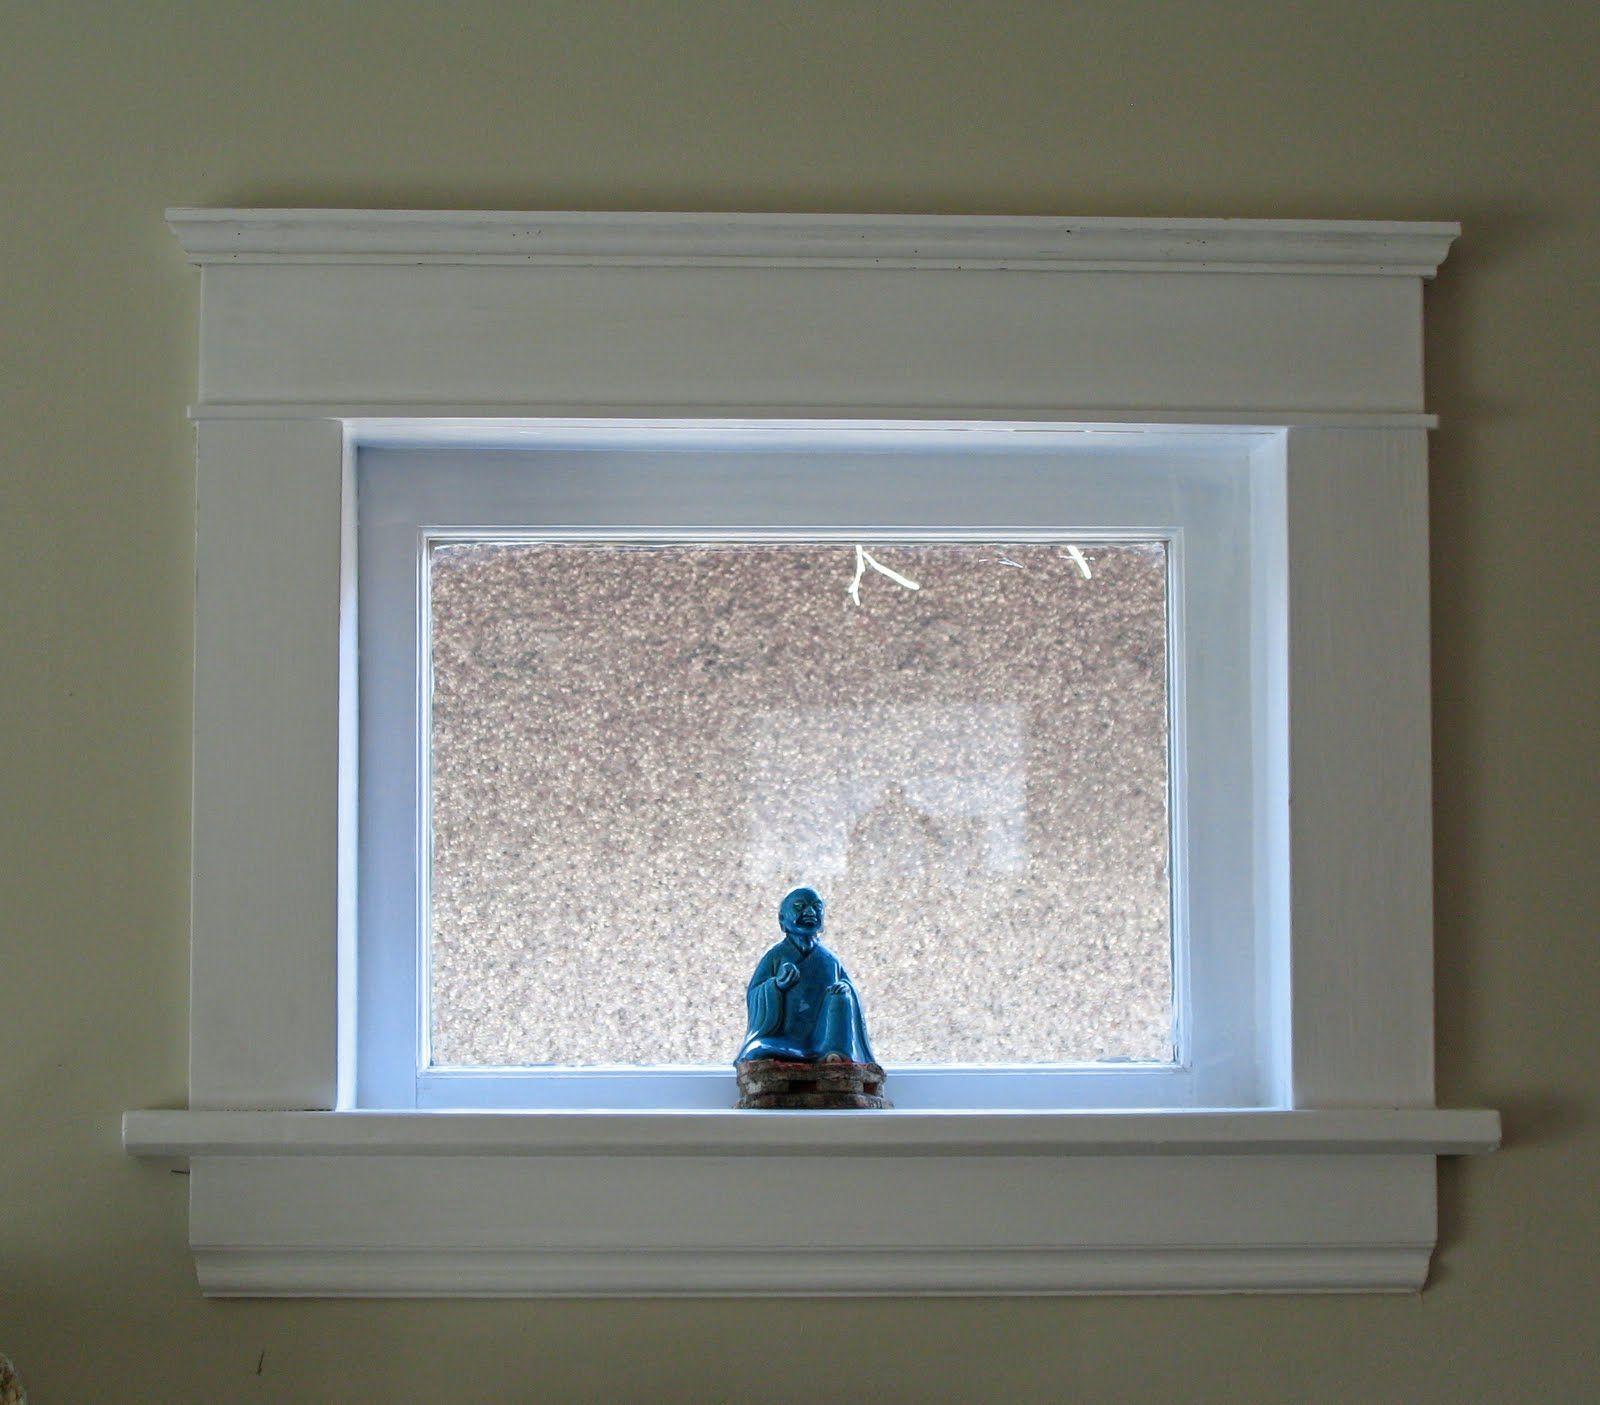 Egress window decor  trim basement windows u  home decor that i love  pinteu